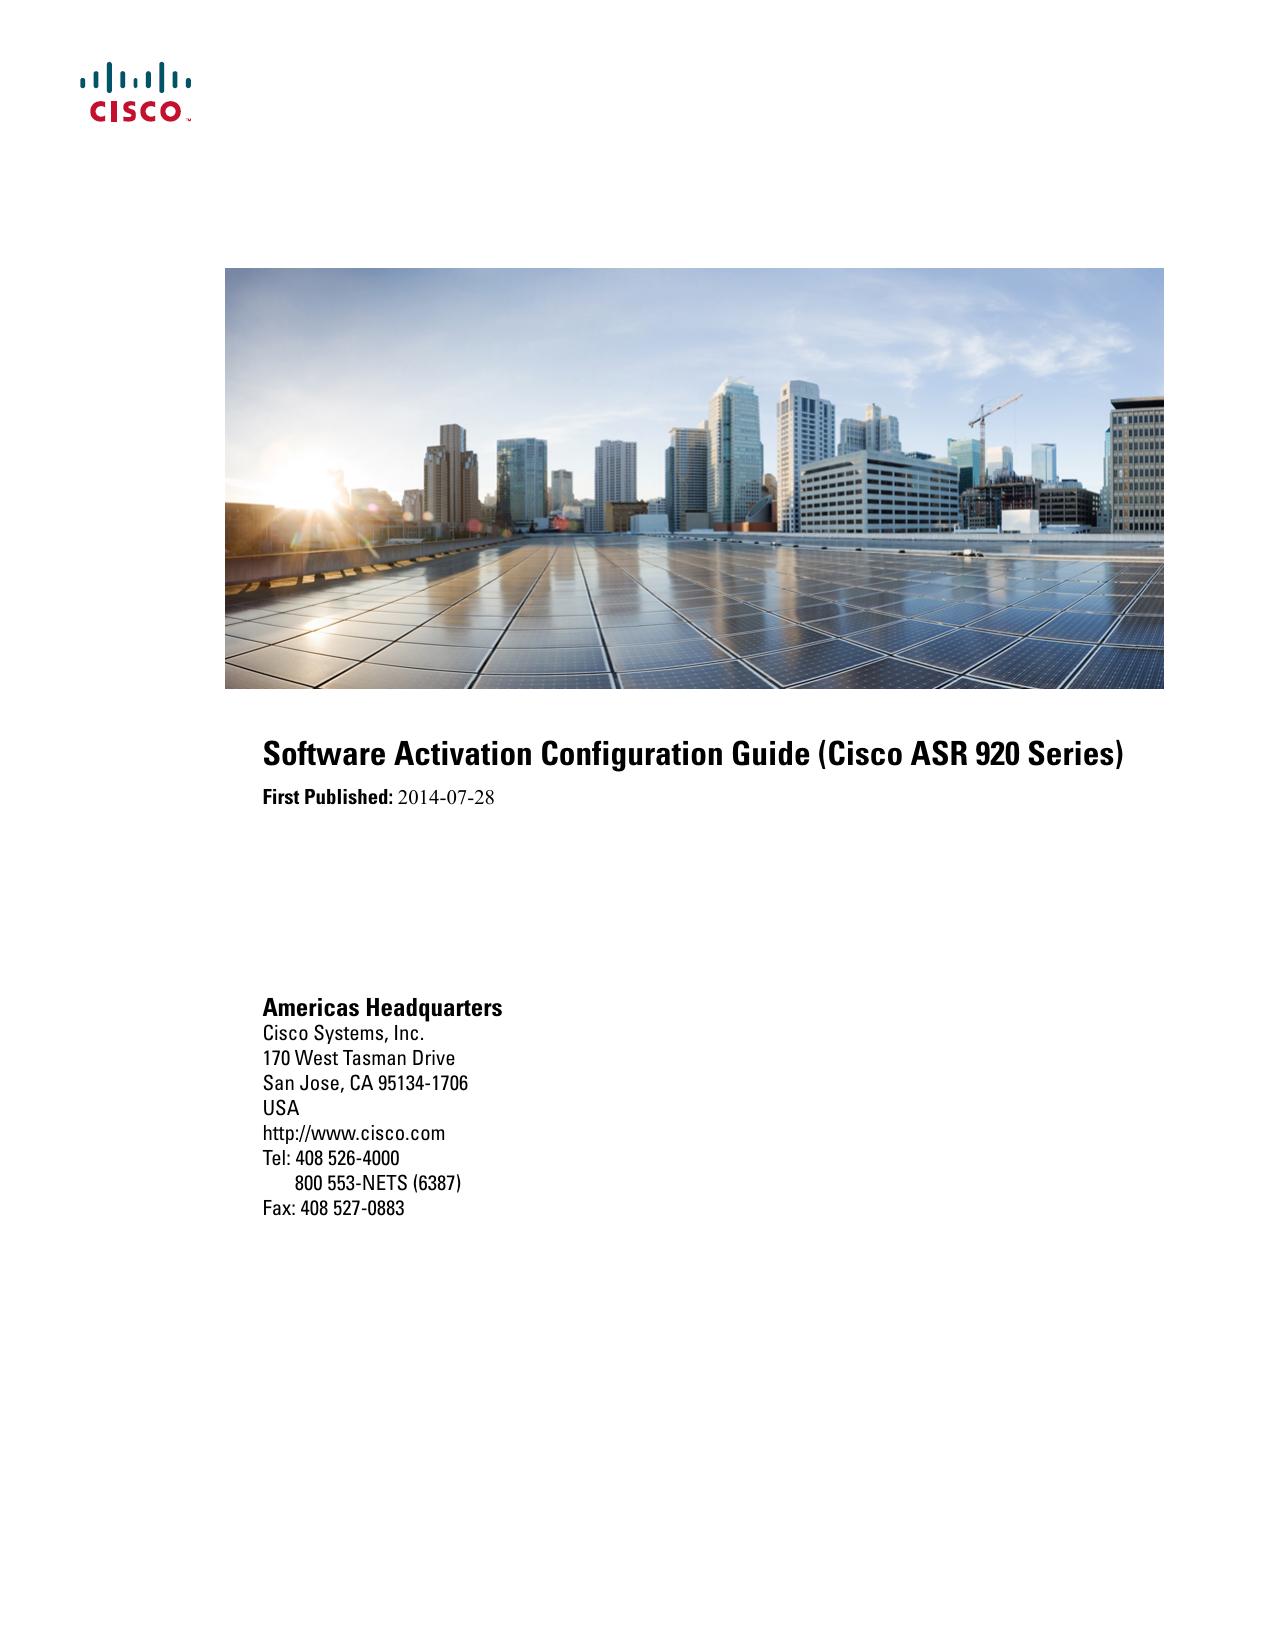 Software Activation Configuration Guide (Cisco ASR 920